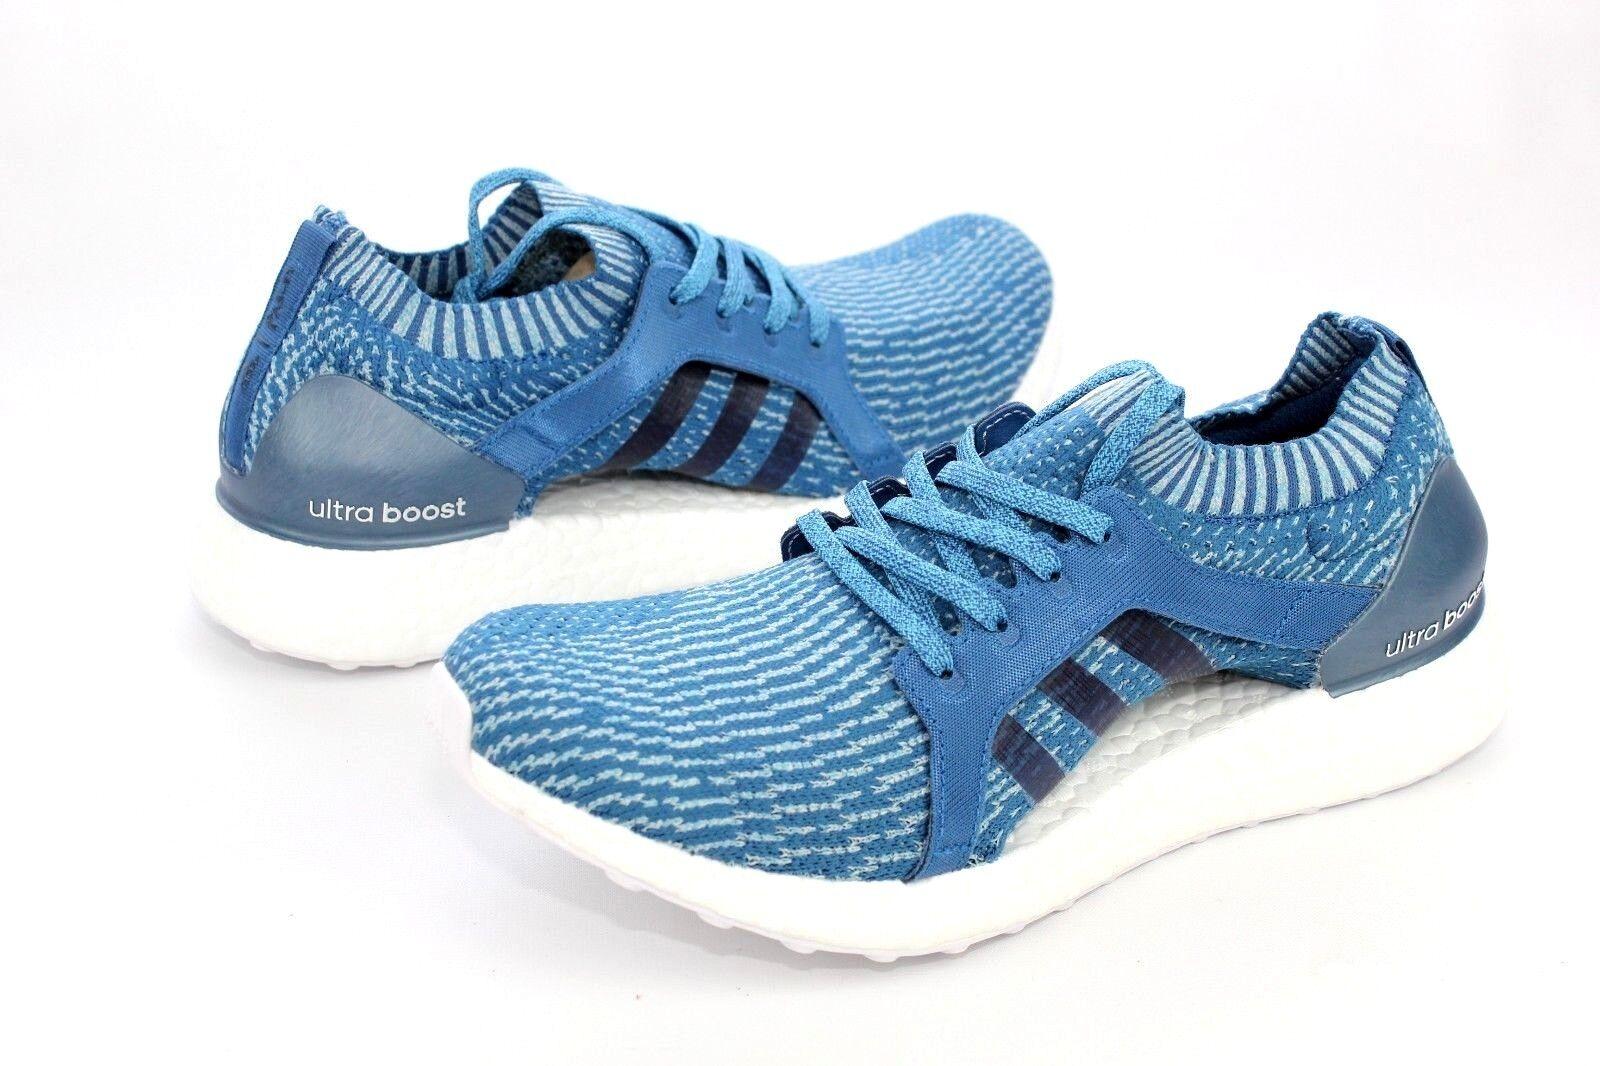 Adidas Ultraboost X Parley Womens Running Shoes Blue Size 9.5 US NIB BB1978